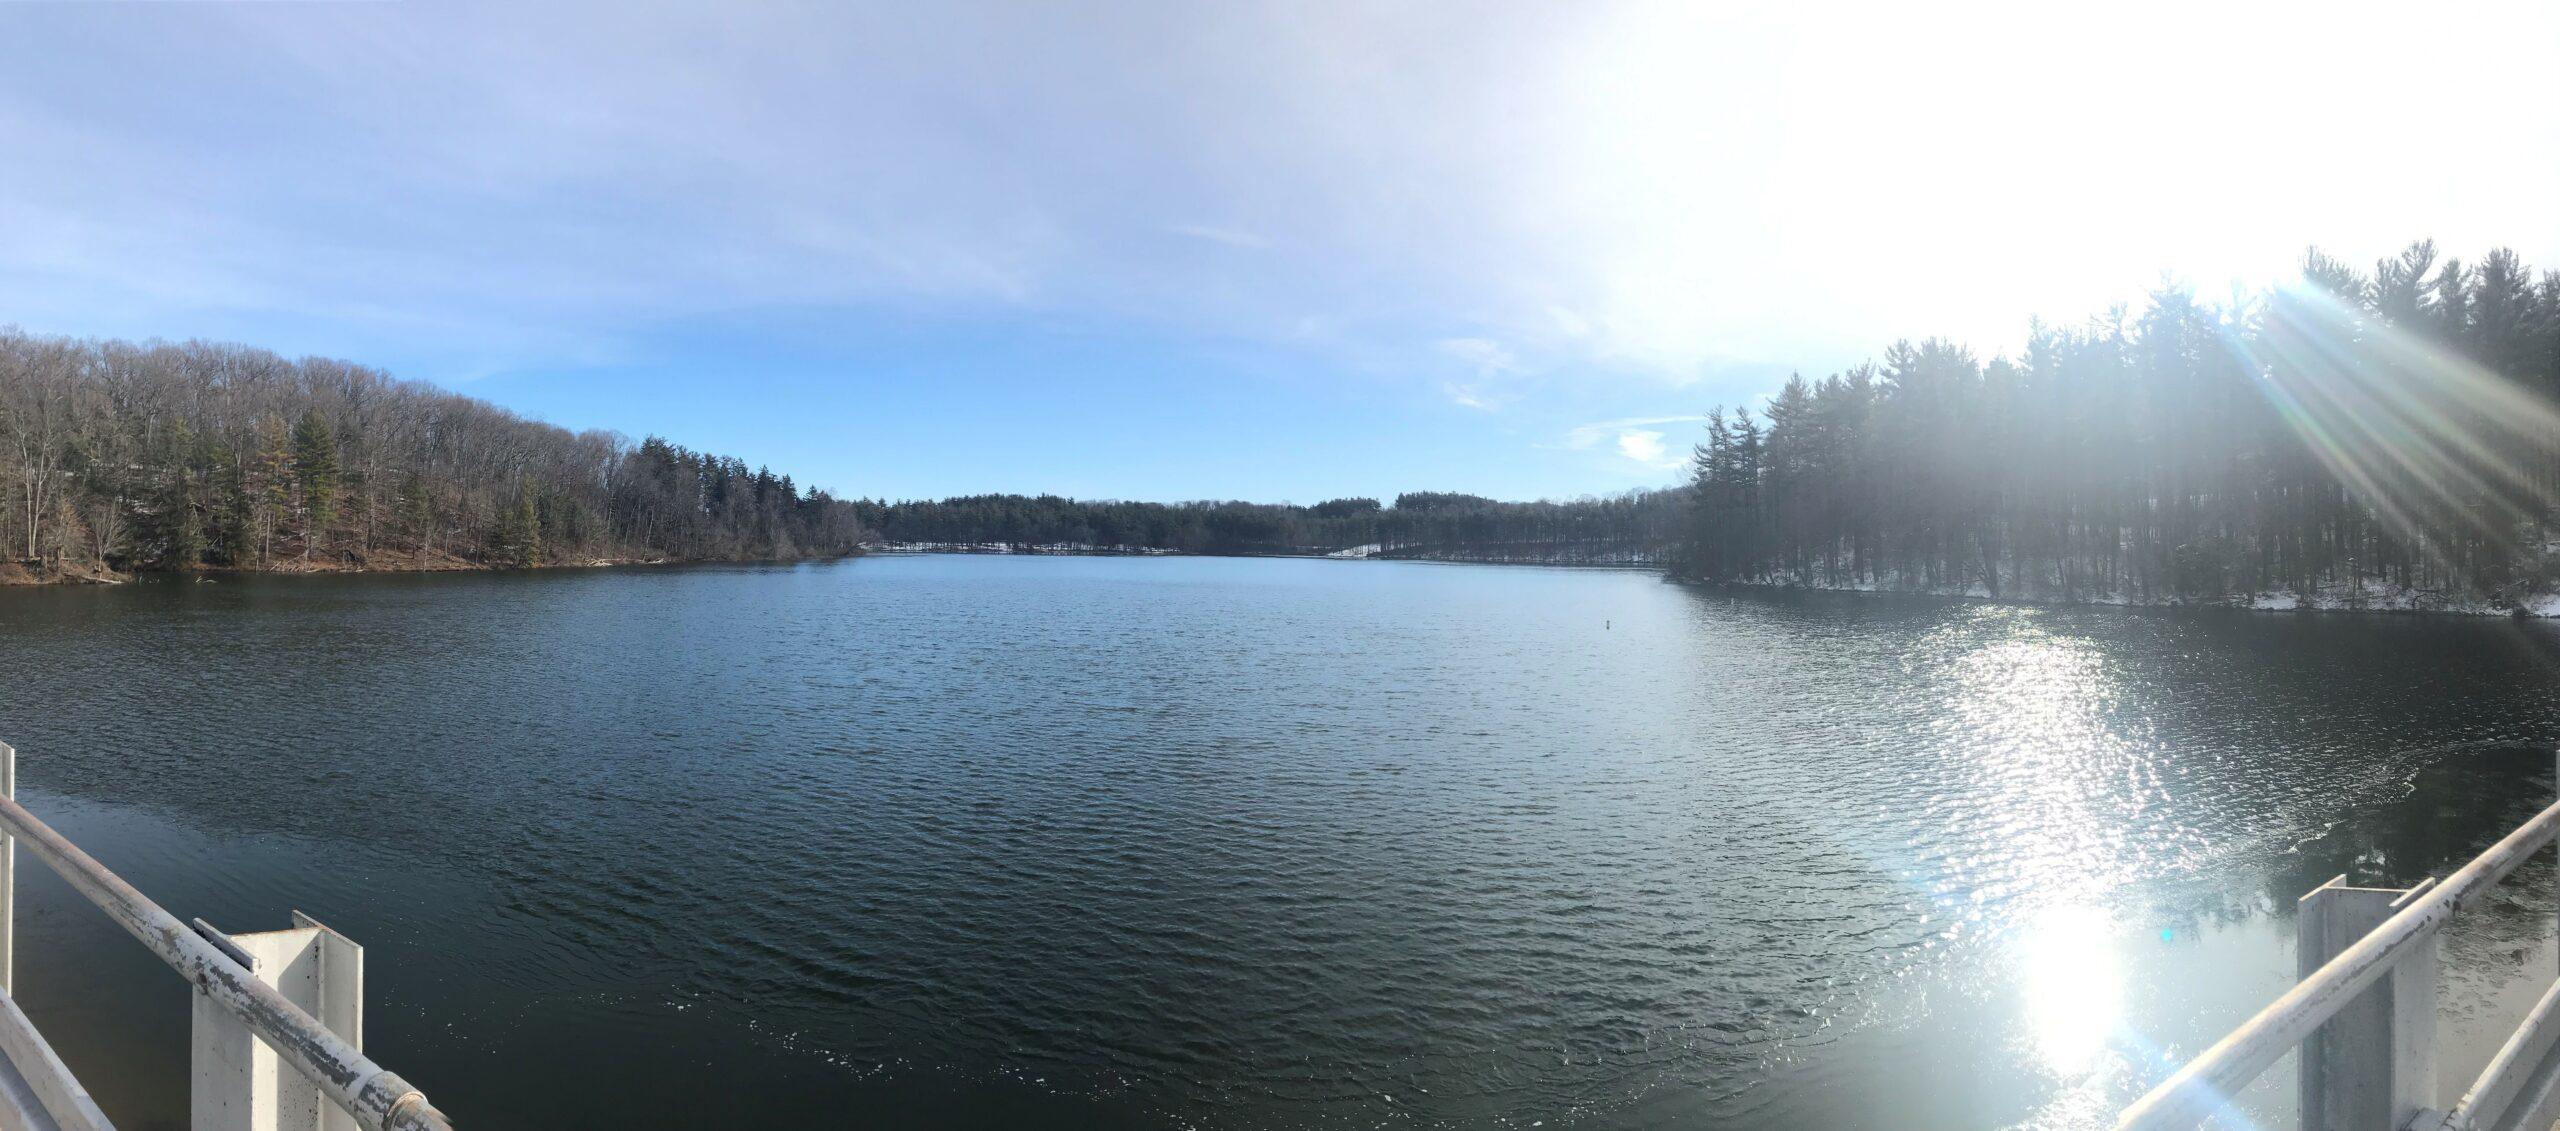 Lake Williams Panorama 01092020